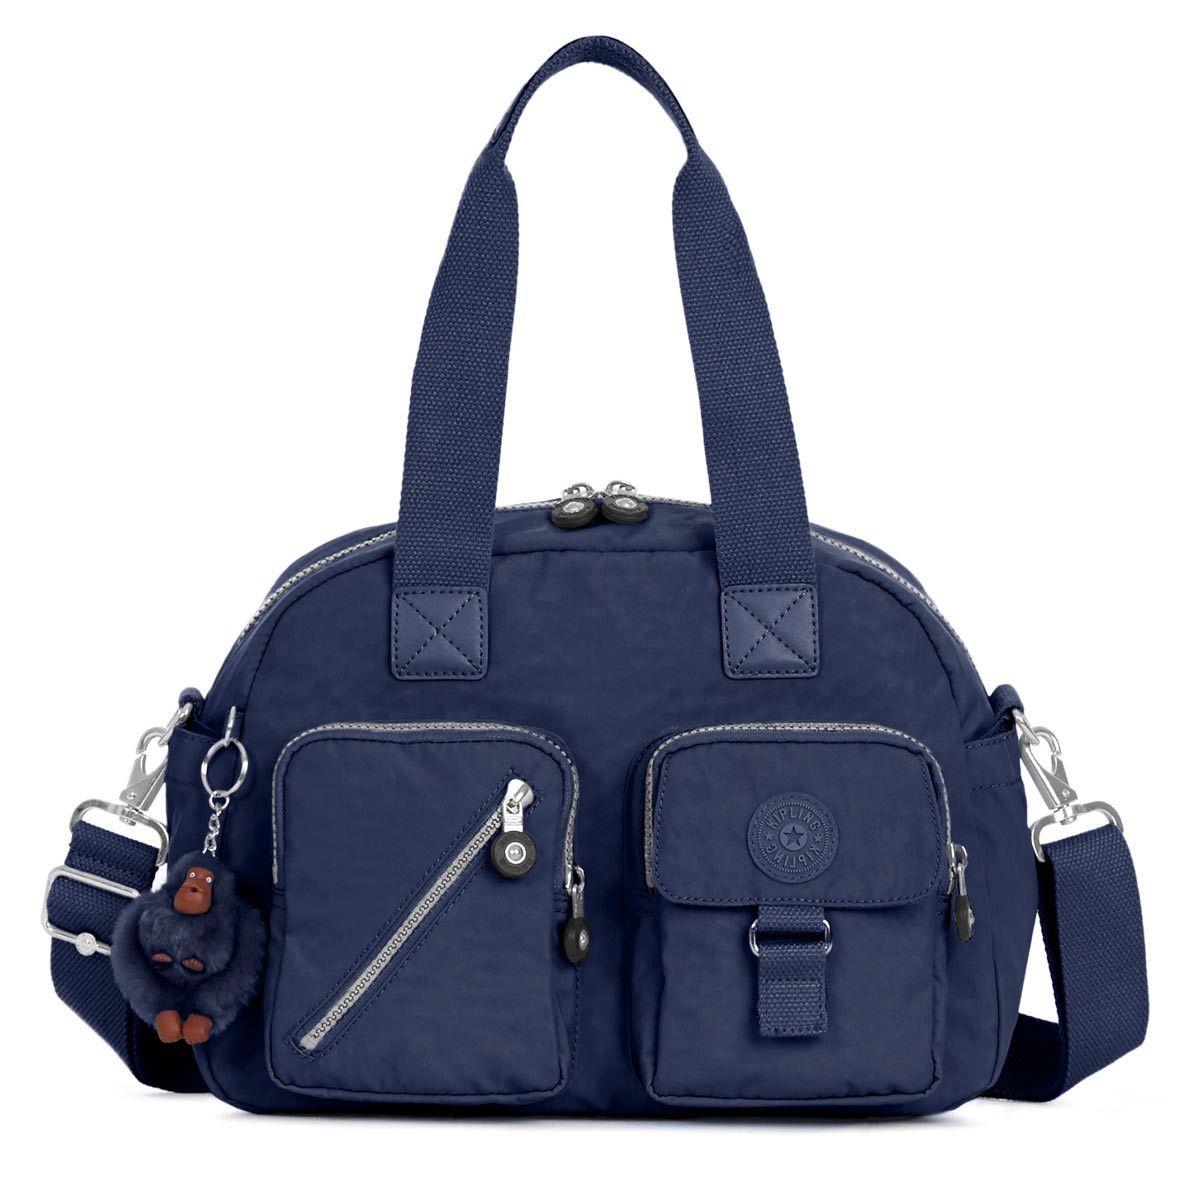 531d1d073 Kipling HB3170-414 Women's Defea True Blue Nylon Crossbody Satchel ...